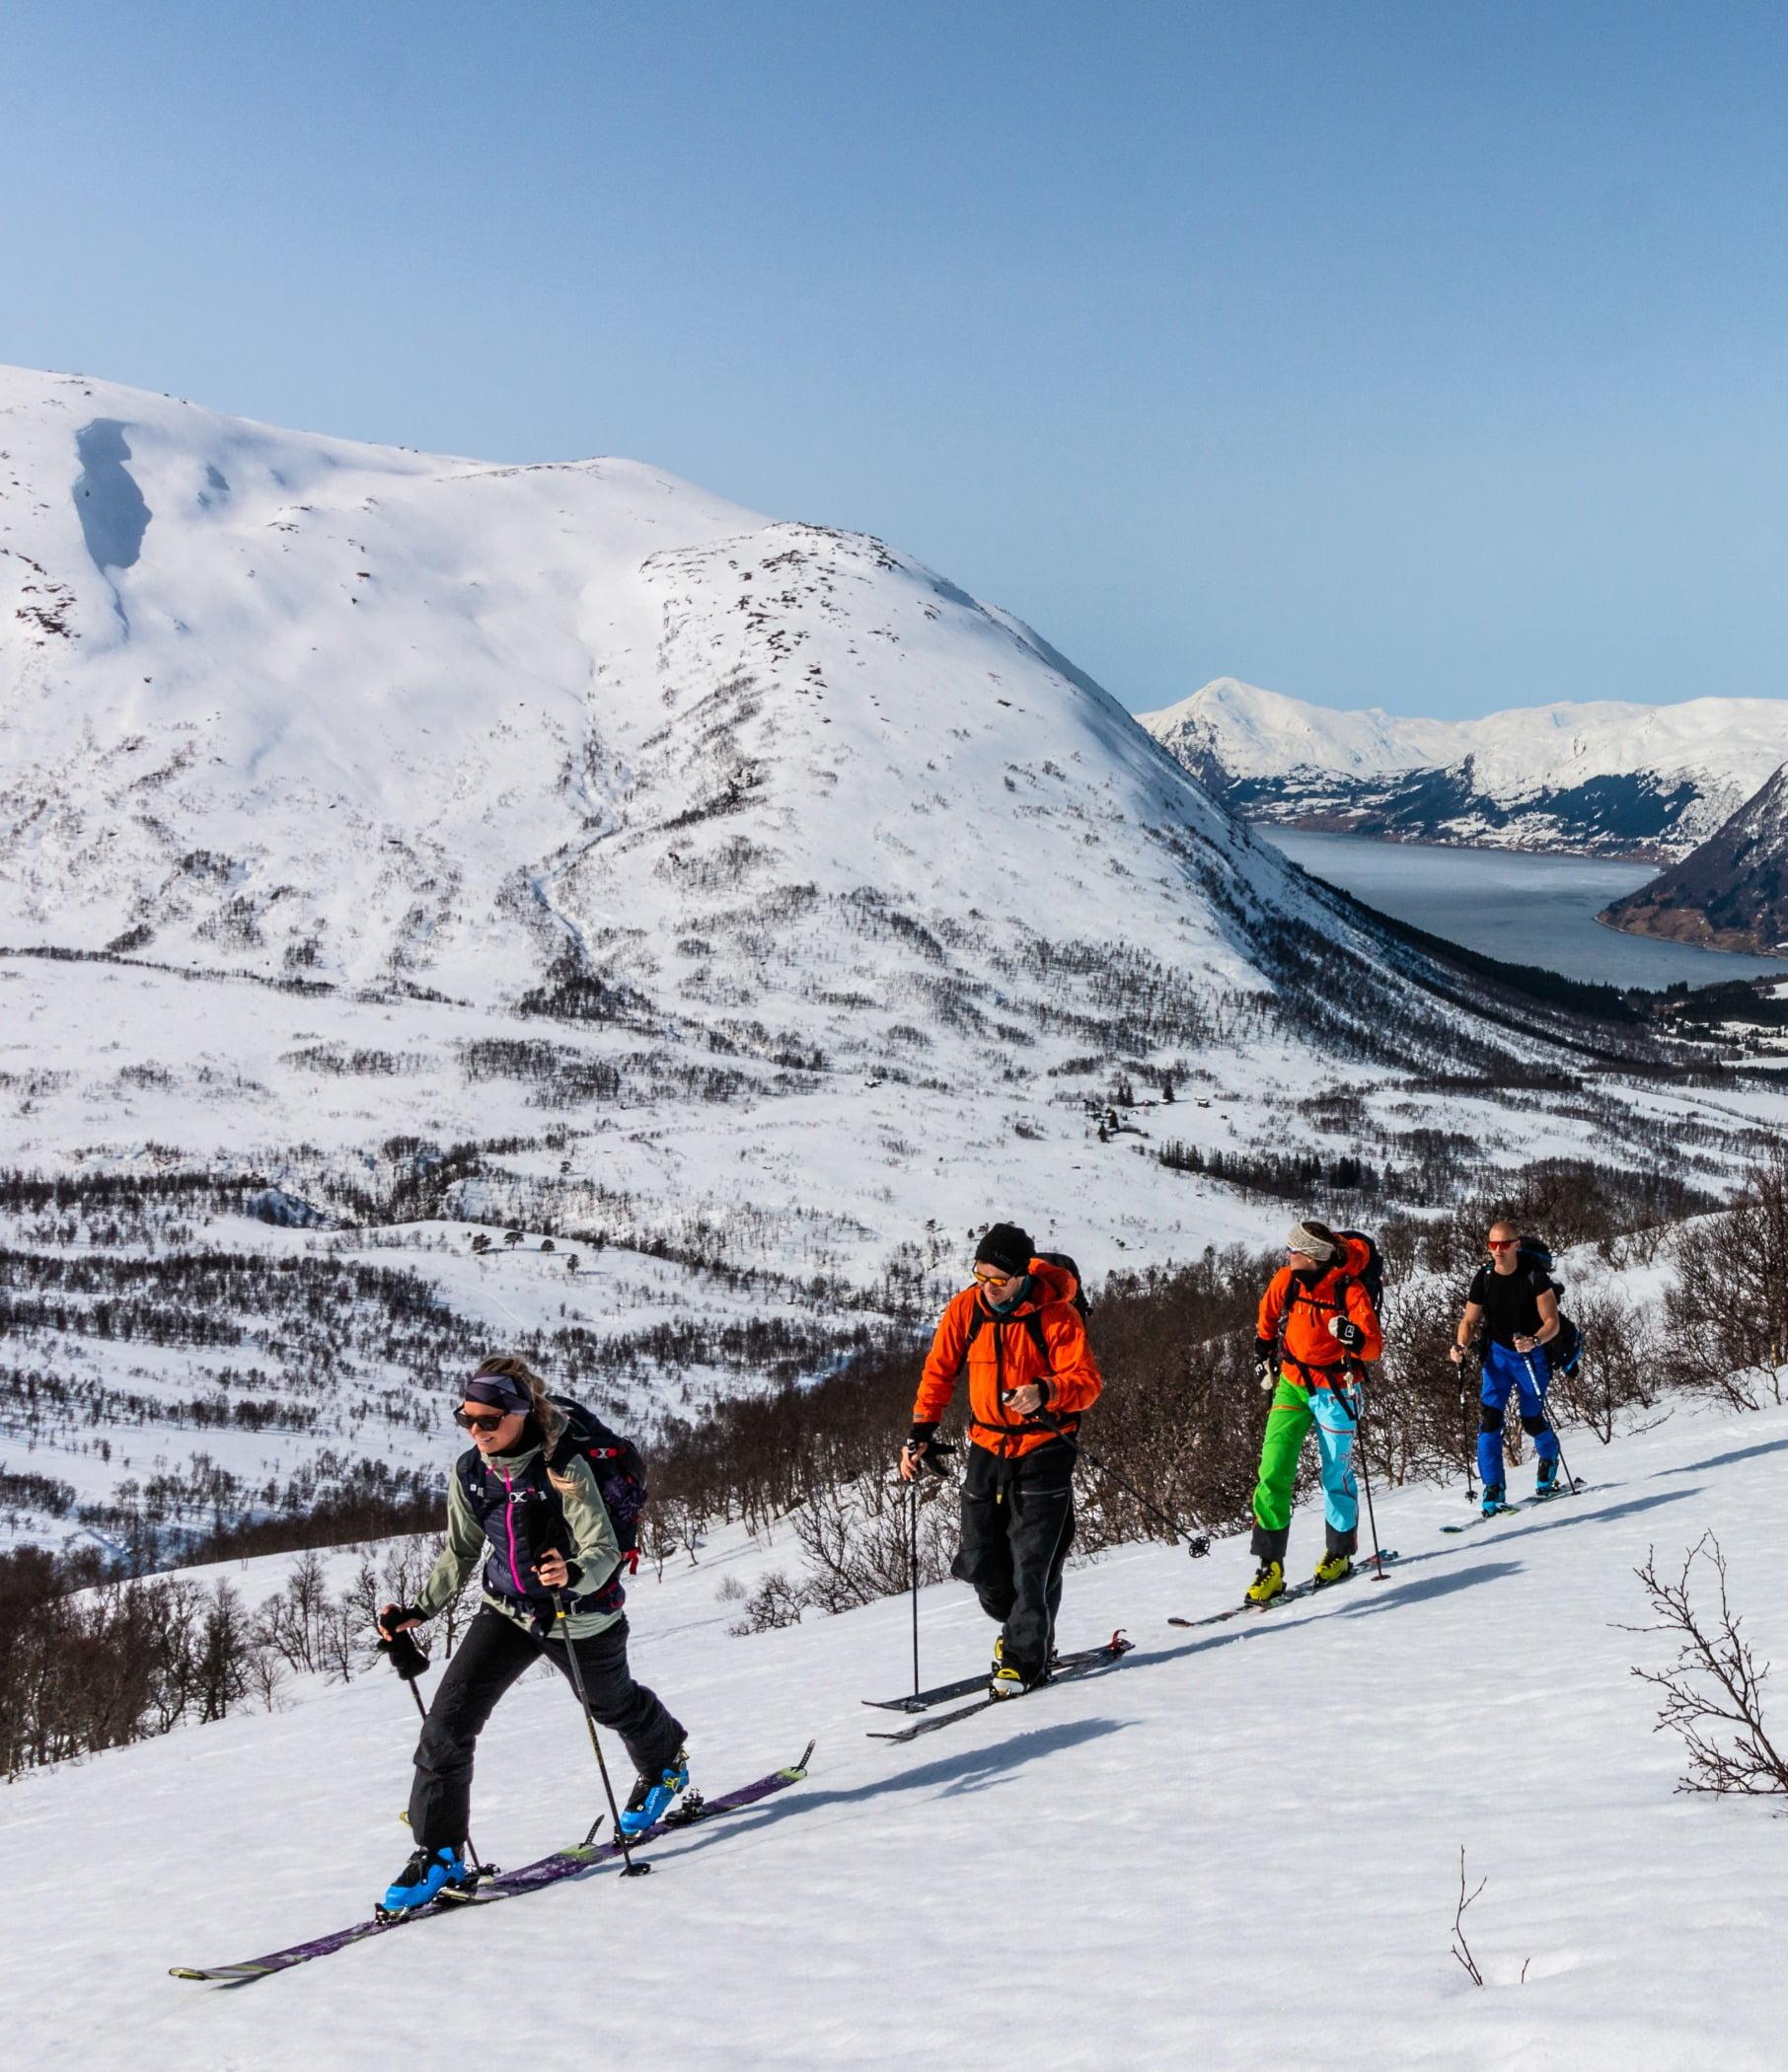 Ski pole, Winter sport, Sports equipment, Skier, Snow, Recreation, Clothing